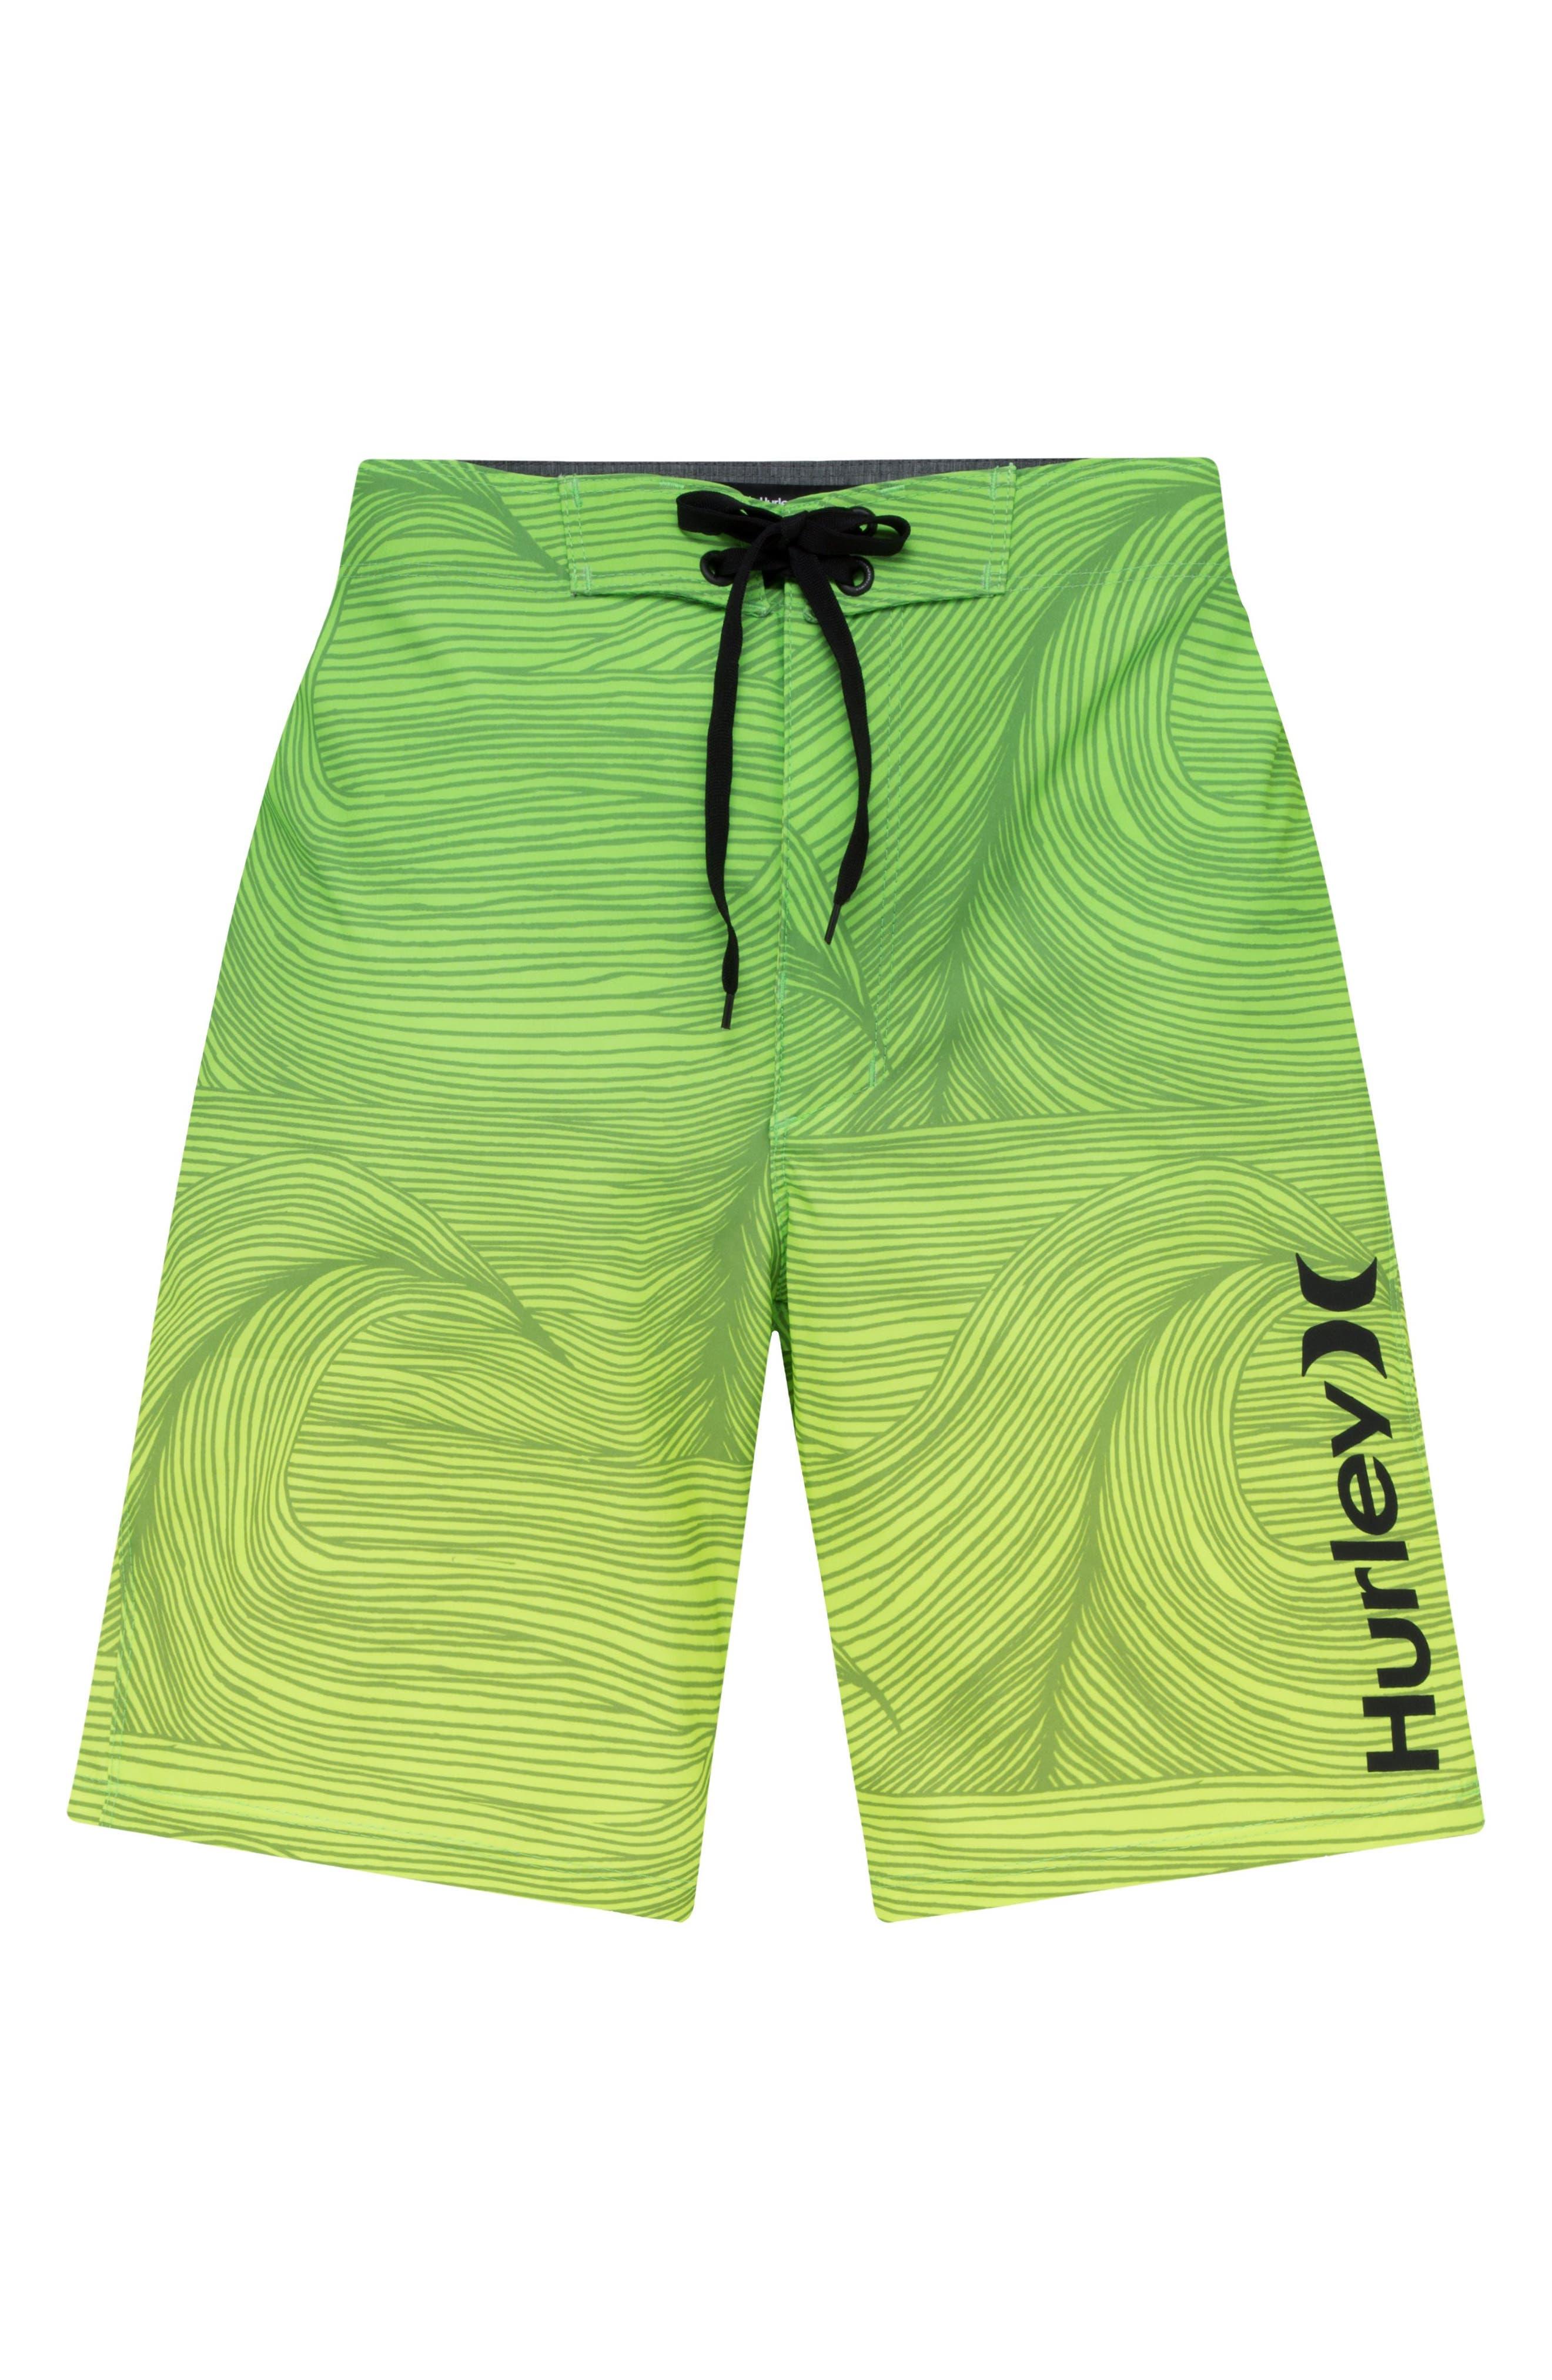 Phantom 30 Brooks Board Shorts,                         Main,                         color, Voltage Green